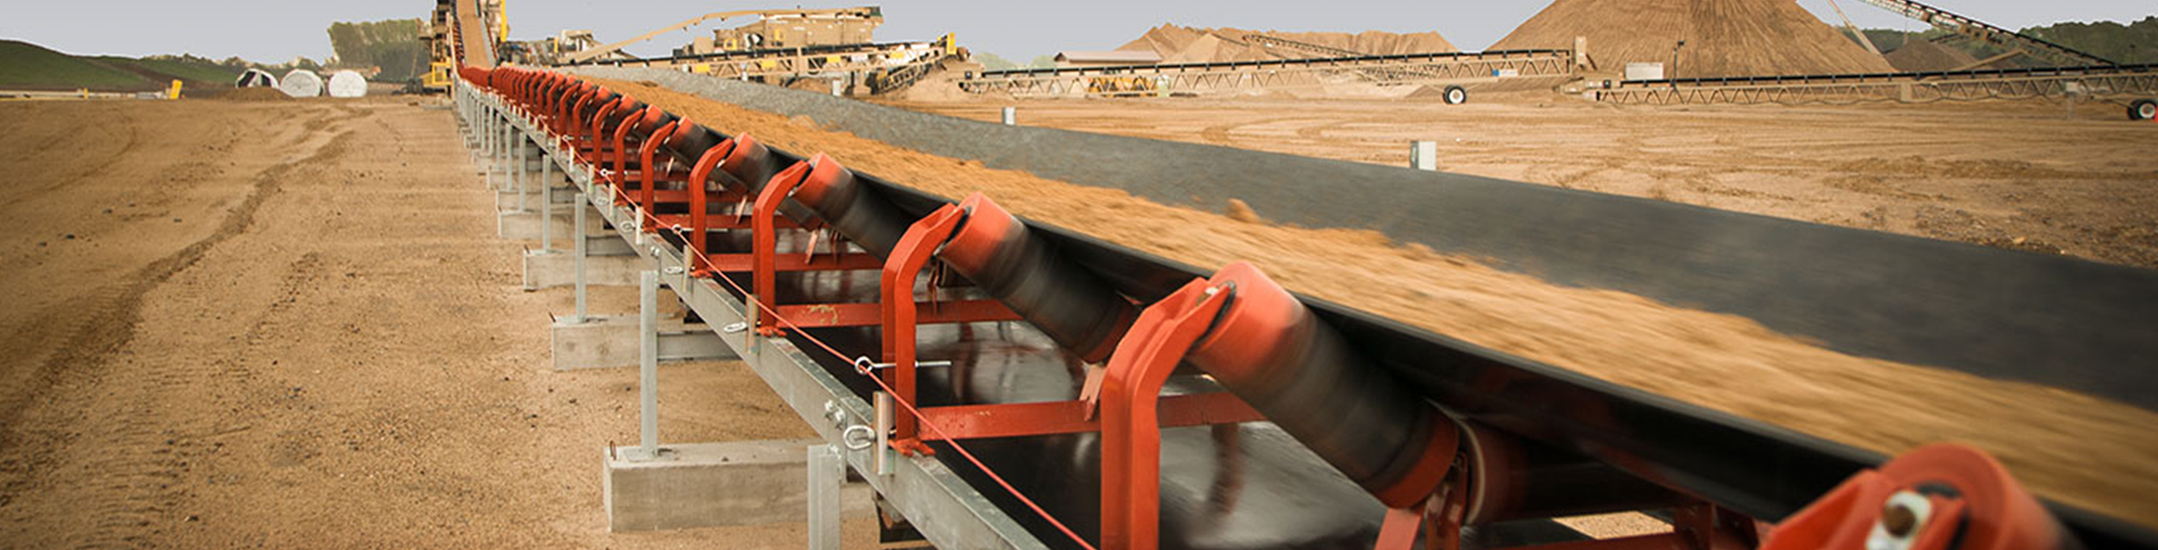 Zipline® Overland Conveyor by Superior Industries